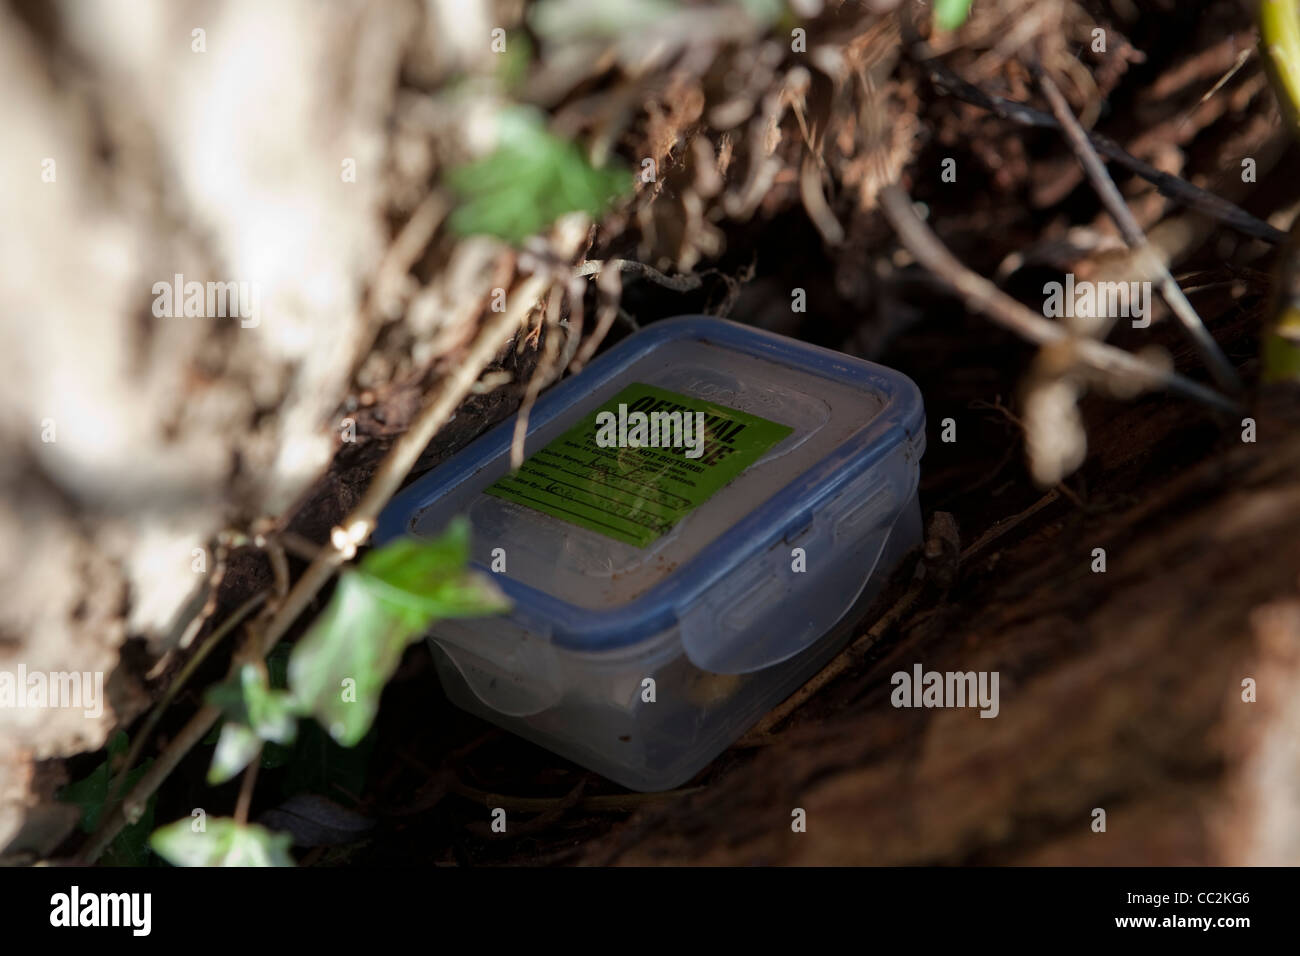 Small tupperware geocache box hidden in woodland environment - Stock Image